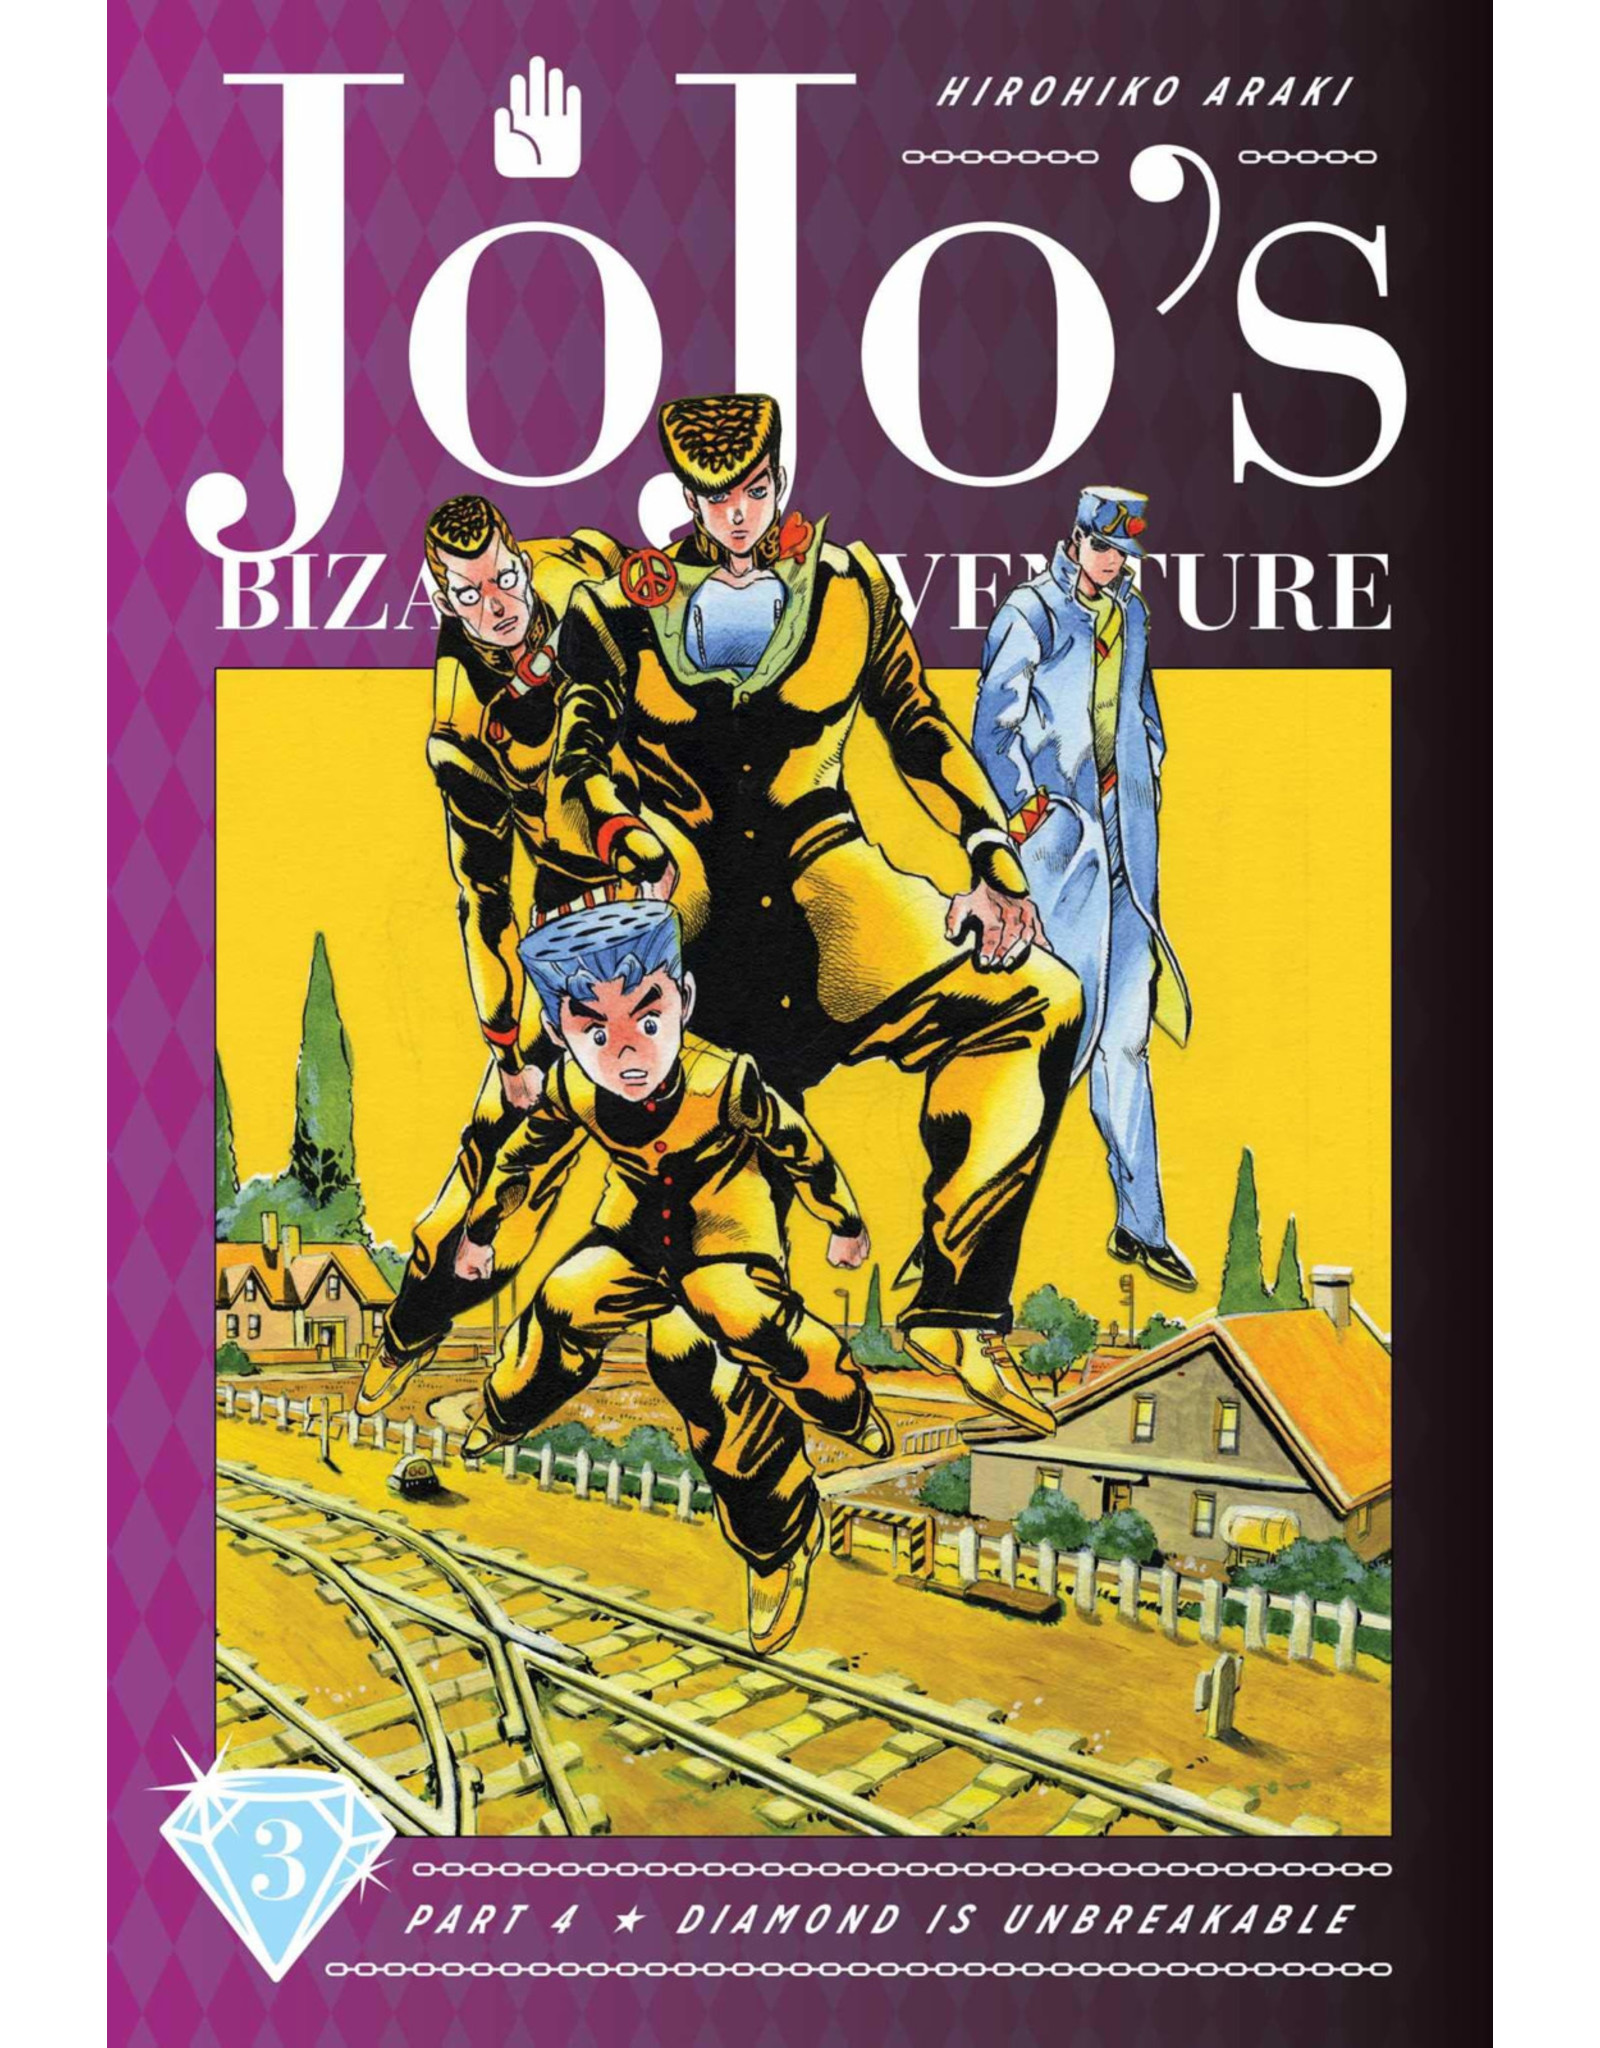 Jojo's Bizarre Adventure - Part 4: Diamond is Unbreakable - Volume 3 - Hardcover (English Version)